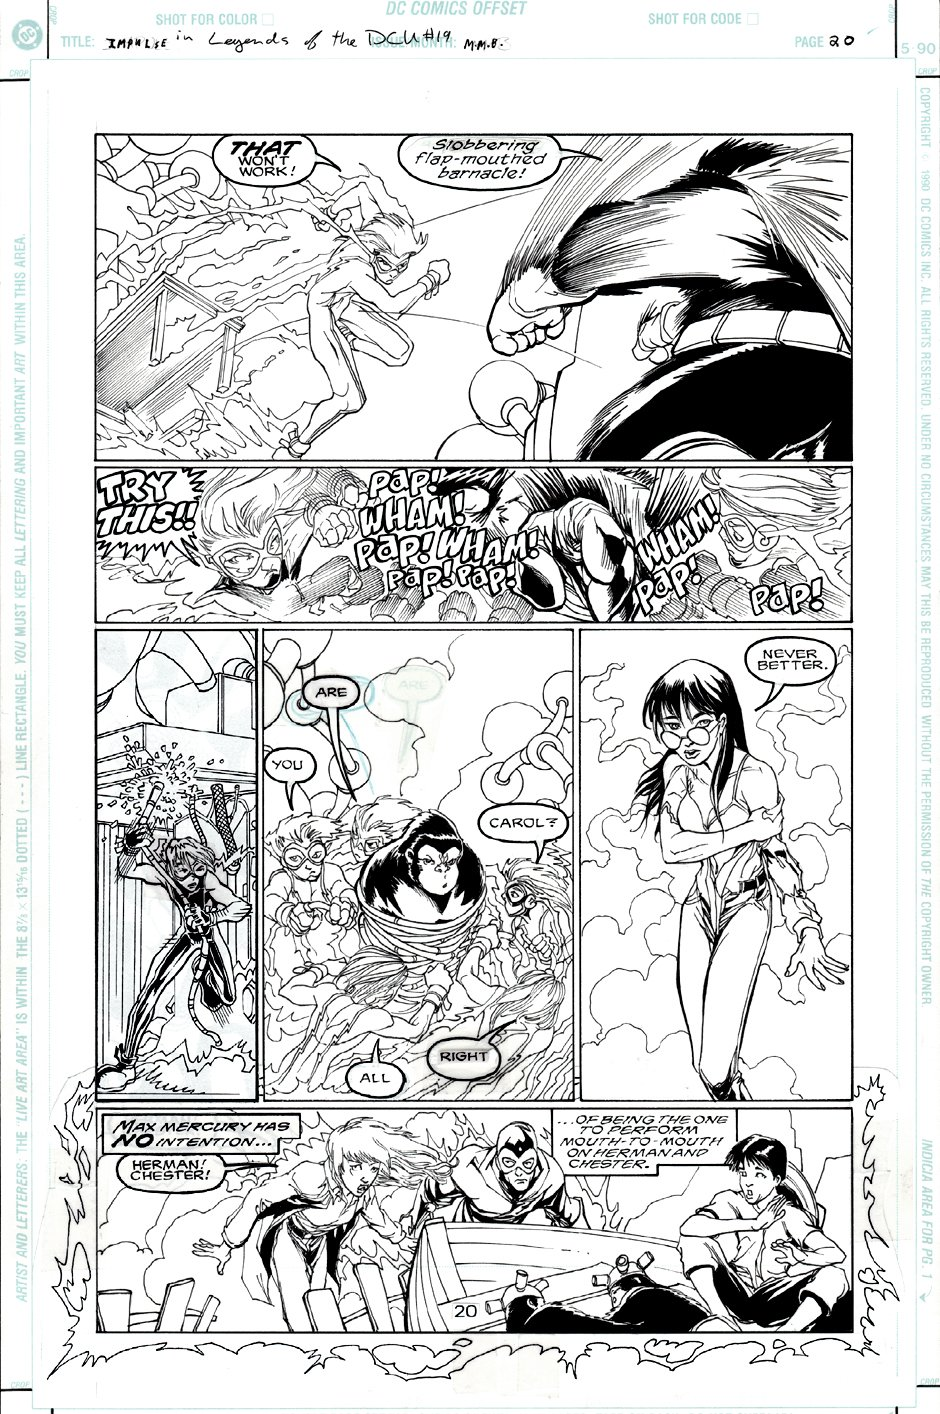 Legends of the DC Universe #19 p 20 (Impulse Battles Gorilla Grodd!) 1999